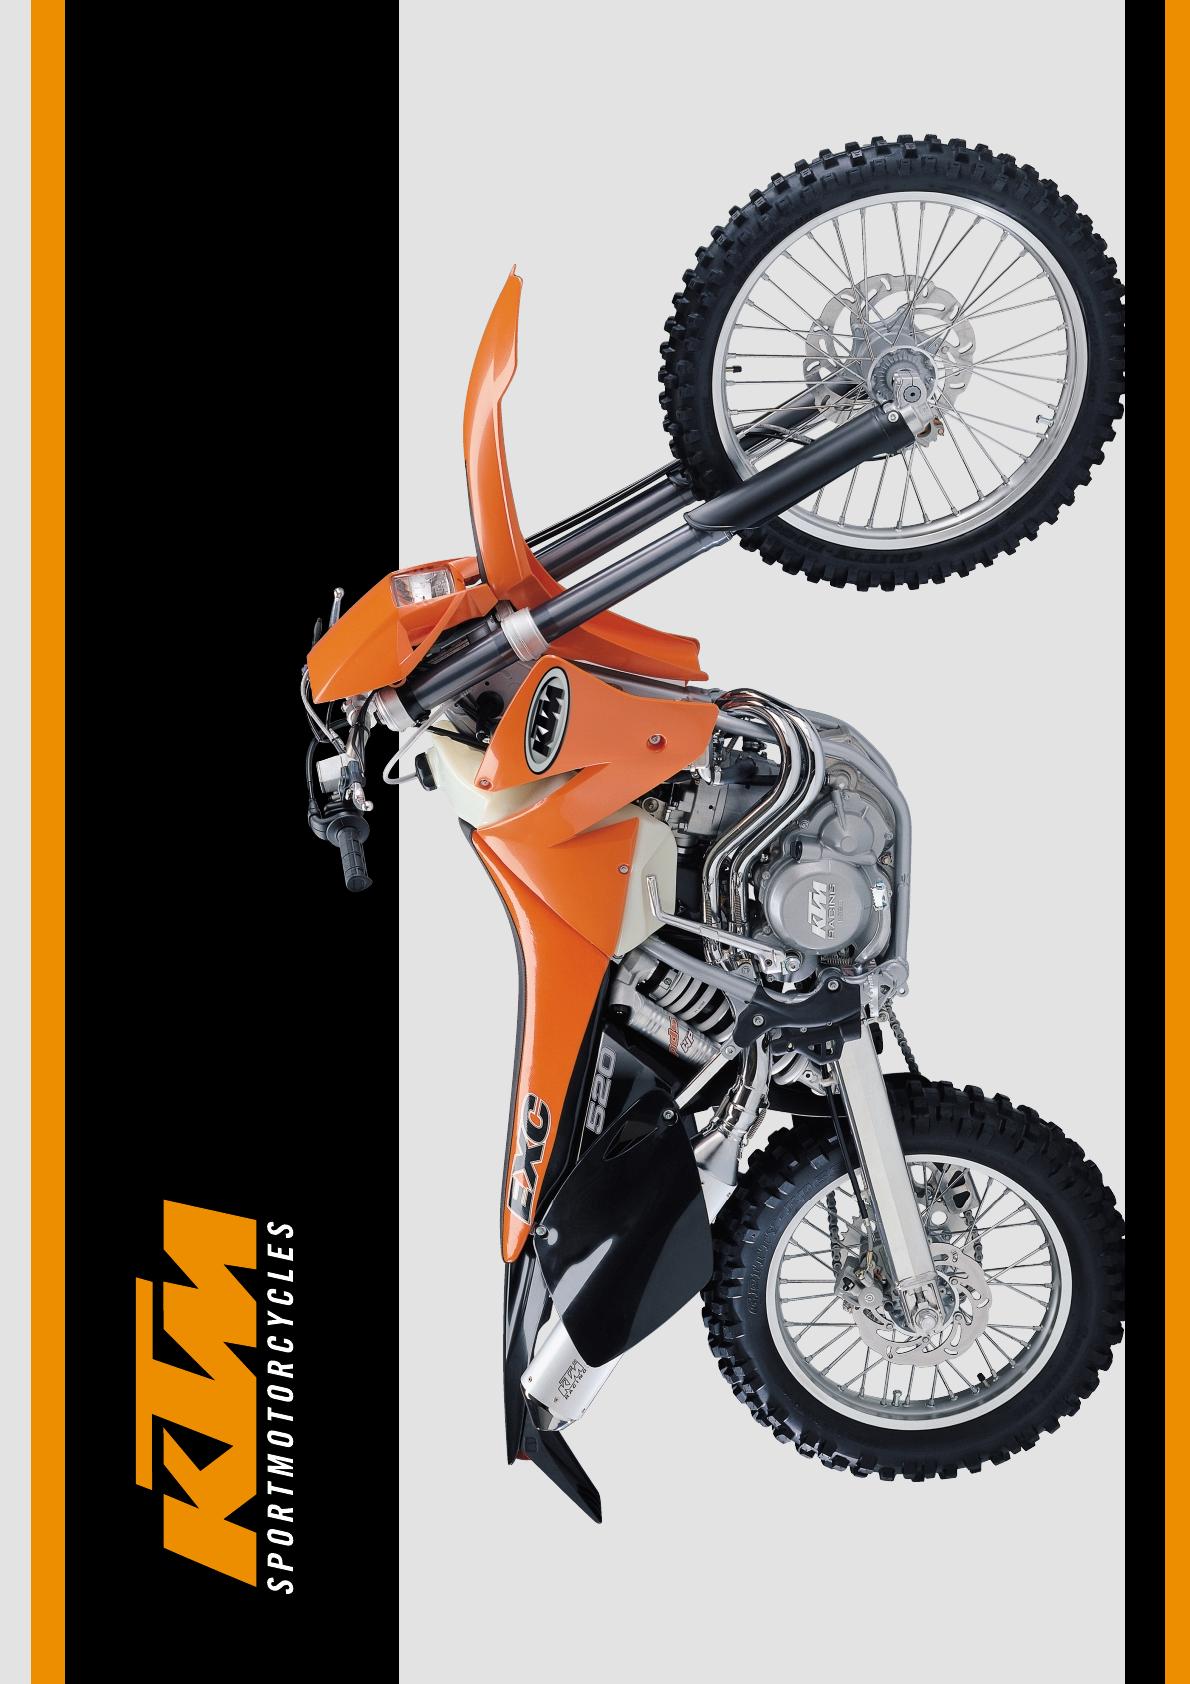 KTM Blank key Spare Motorcycle Key red head twin groove 40mm blade length